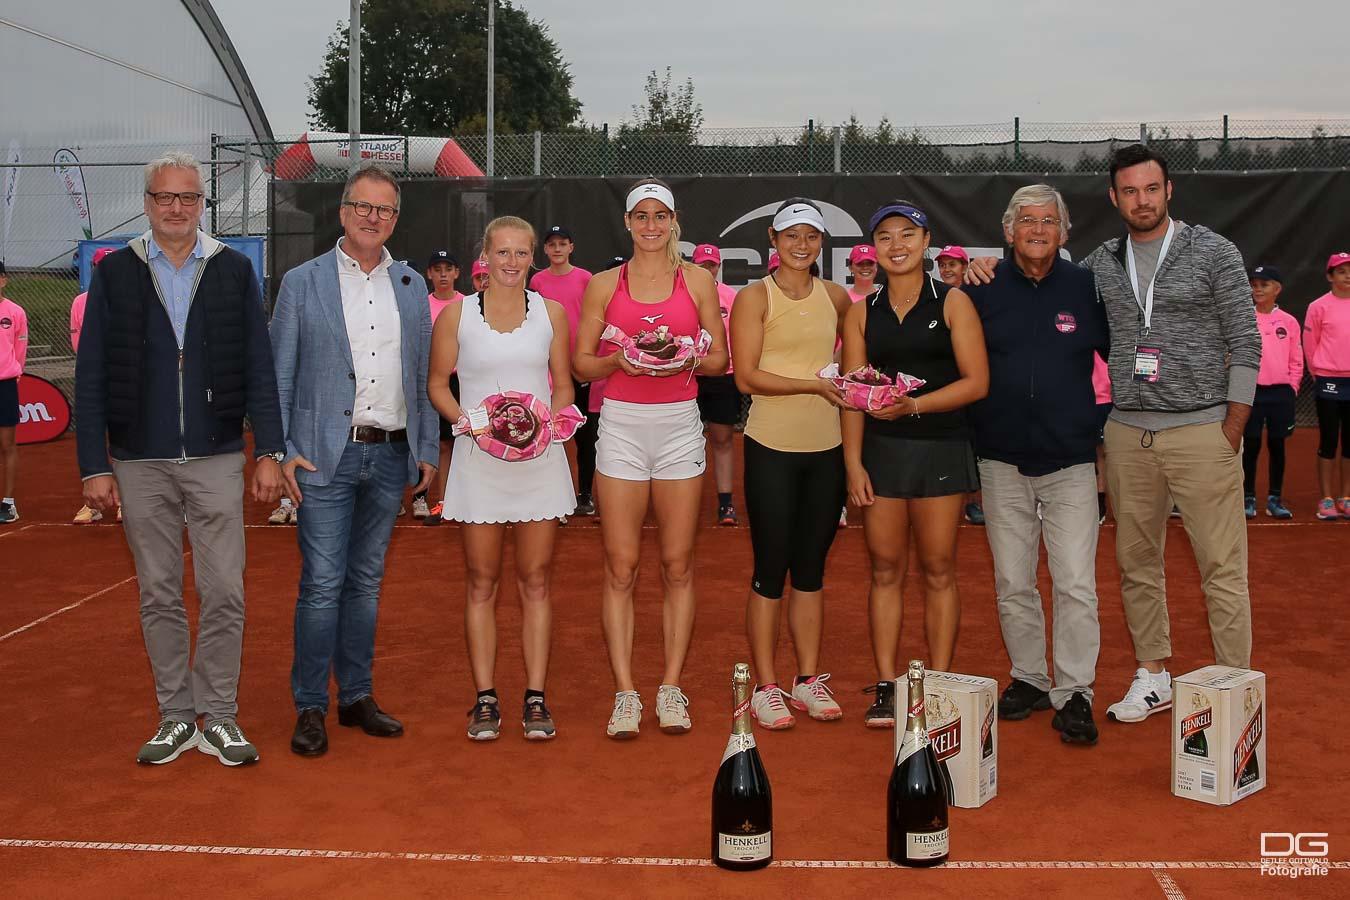 Wiesbaden Tennis Open 2021 |  Foto: Detlef Gottwald | www.detlef-gottwald.de